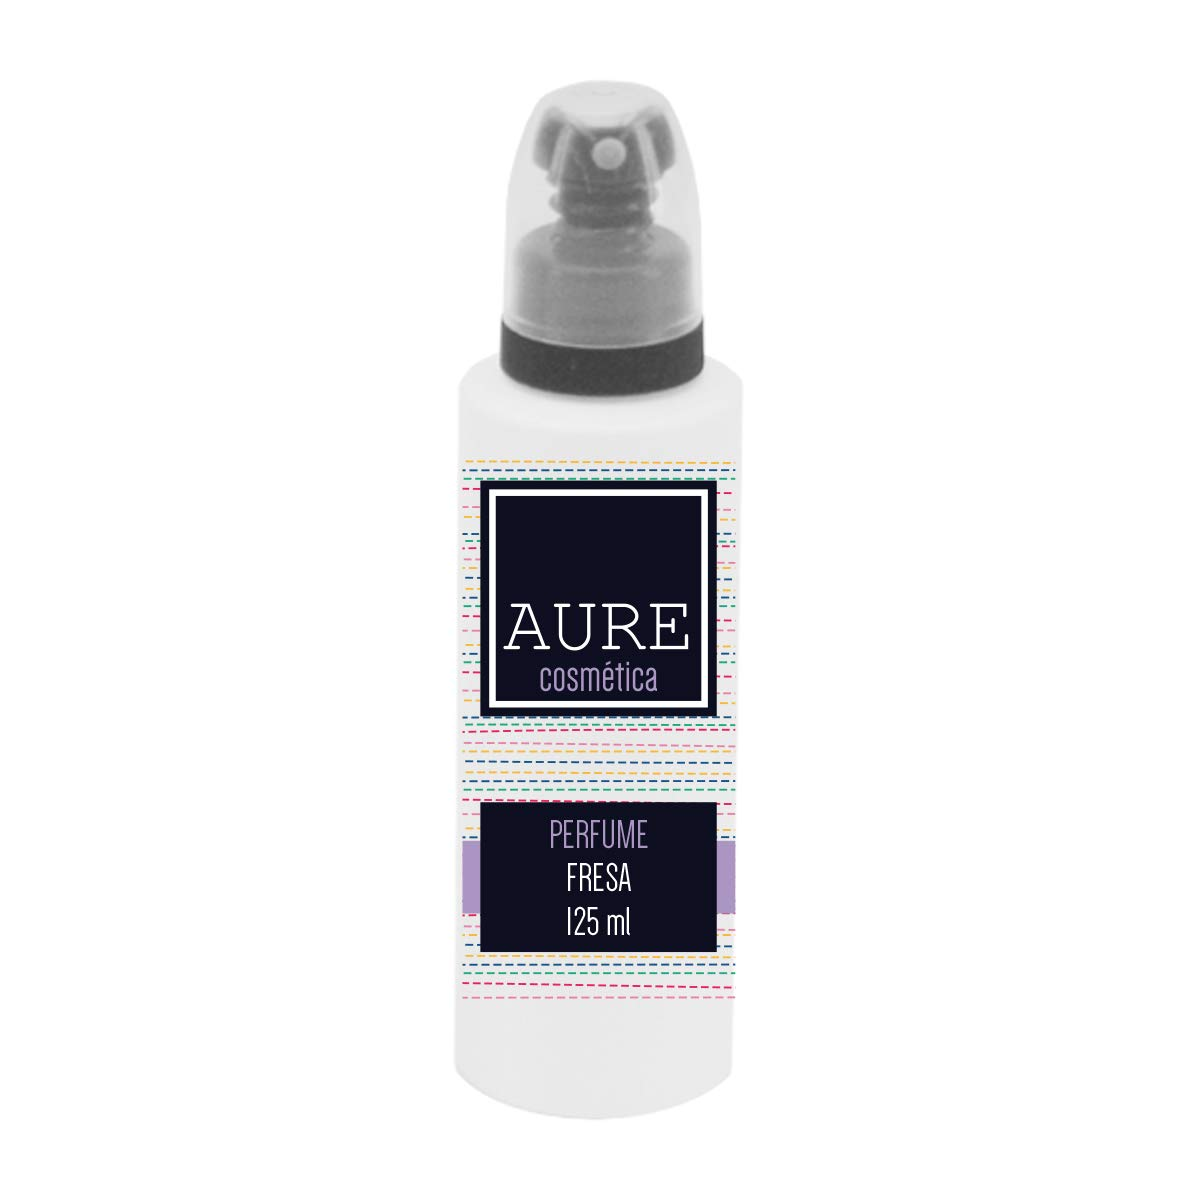 Aure AU205443 Perfume de Fresa, 125 ml: Amazon.es: Productos para mascotas